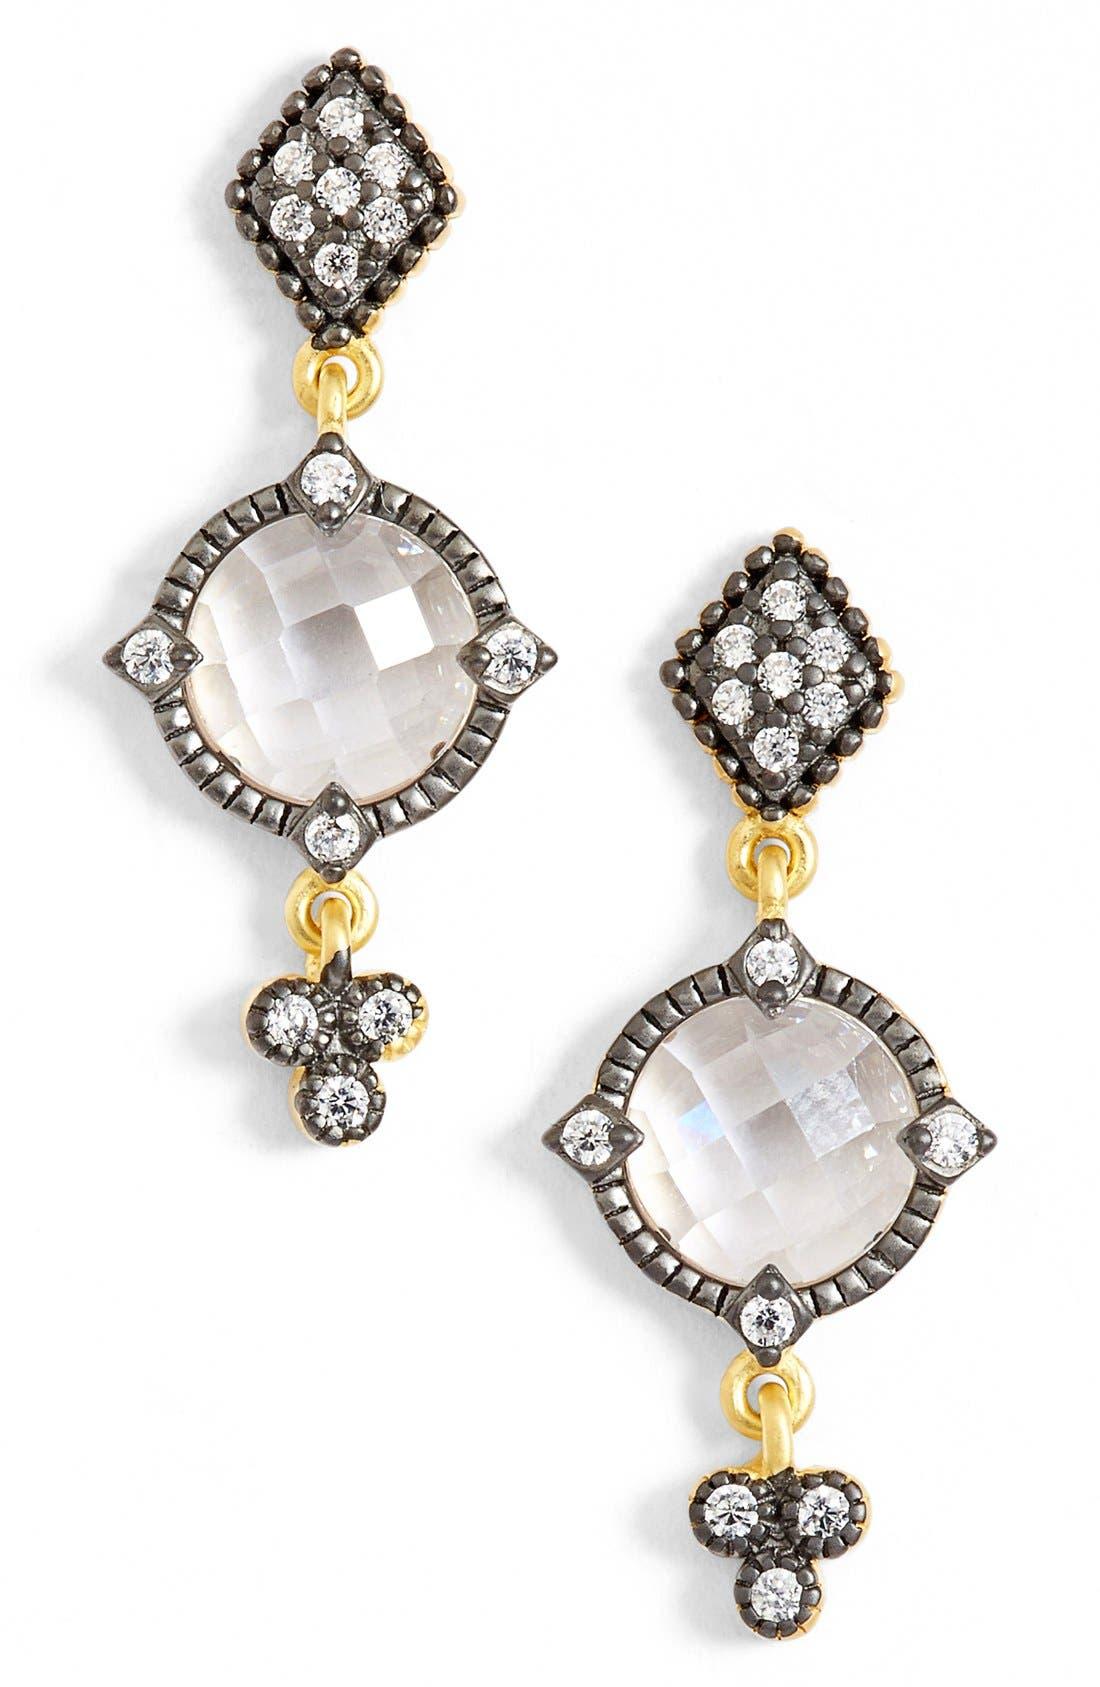 Main Image - FREIDA ROTHMAN Metropolitan Drop Earrings